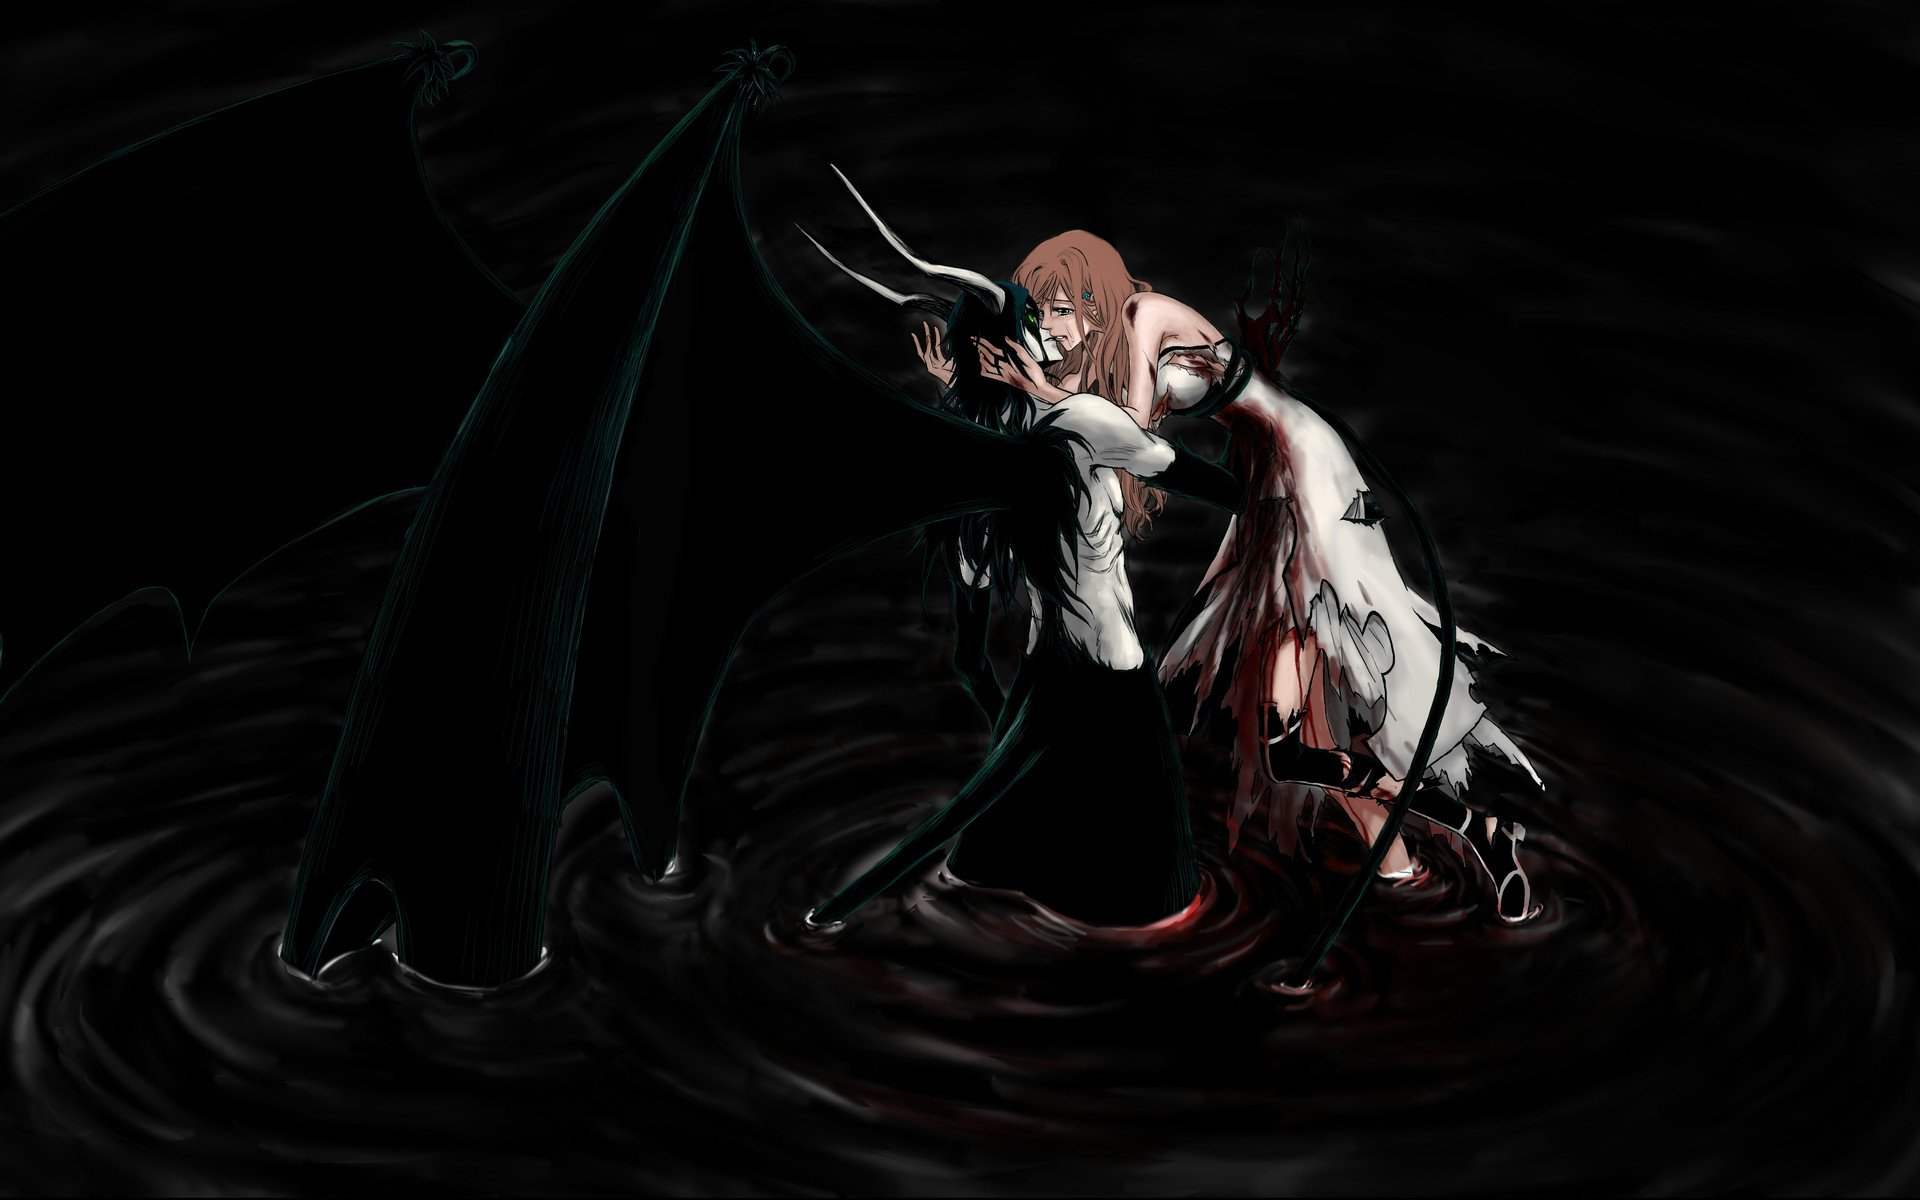 76 romantic anime wallpapers on wallpapersafari - Wallpaper dark anime ...